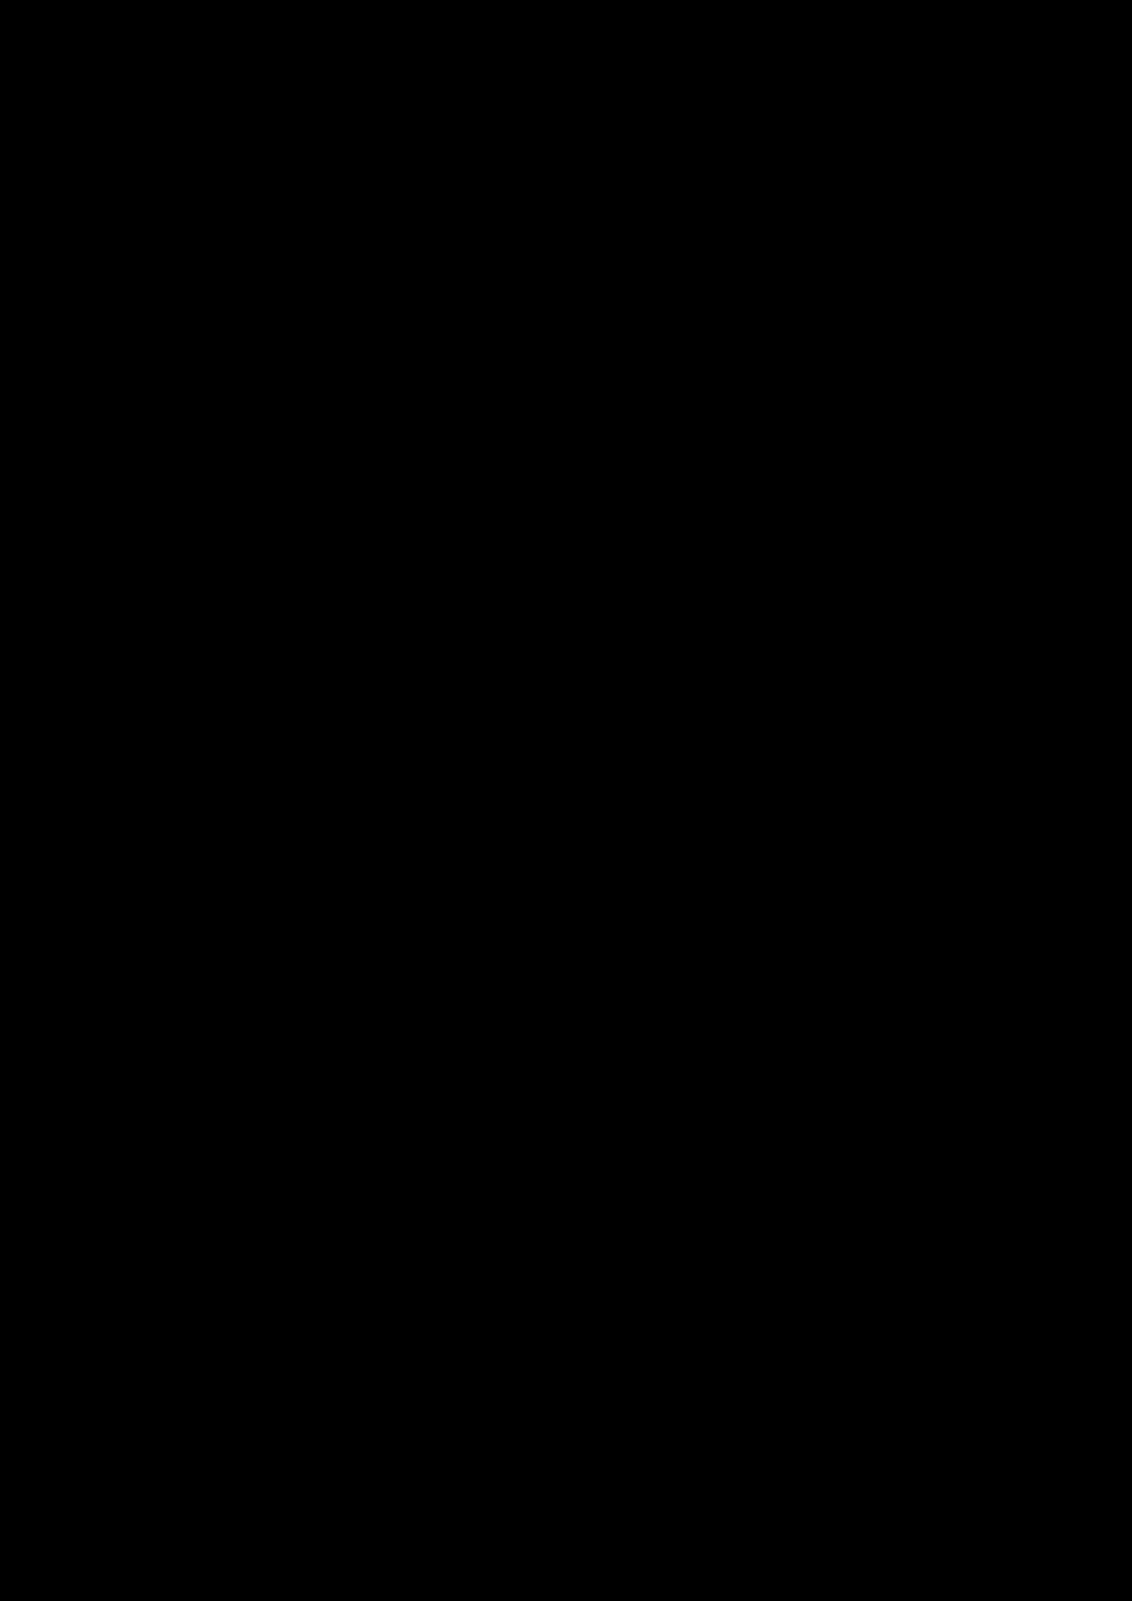 Korolevstvo slez slide, Image 18